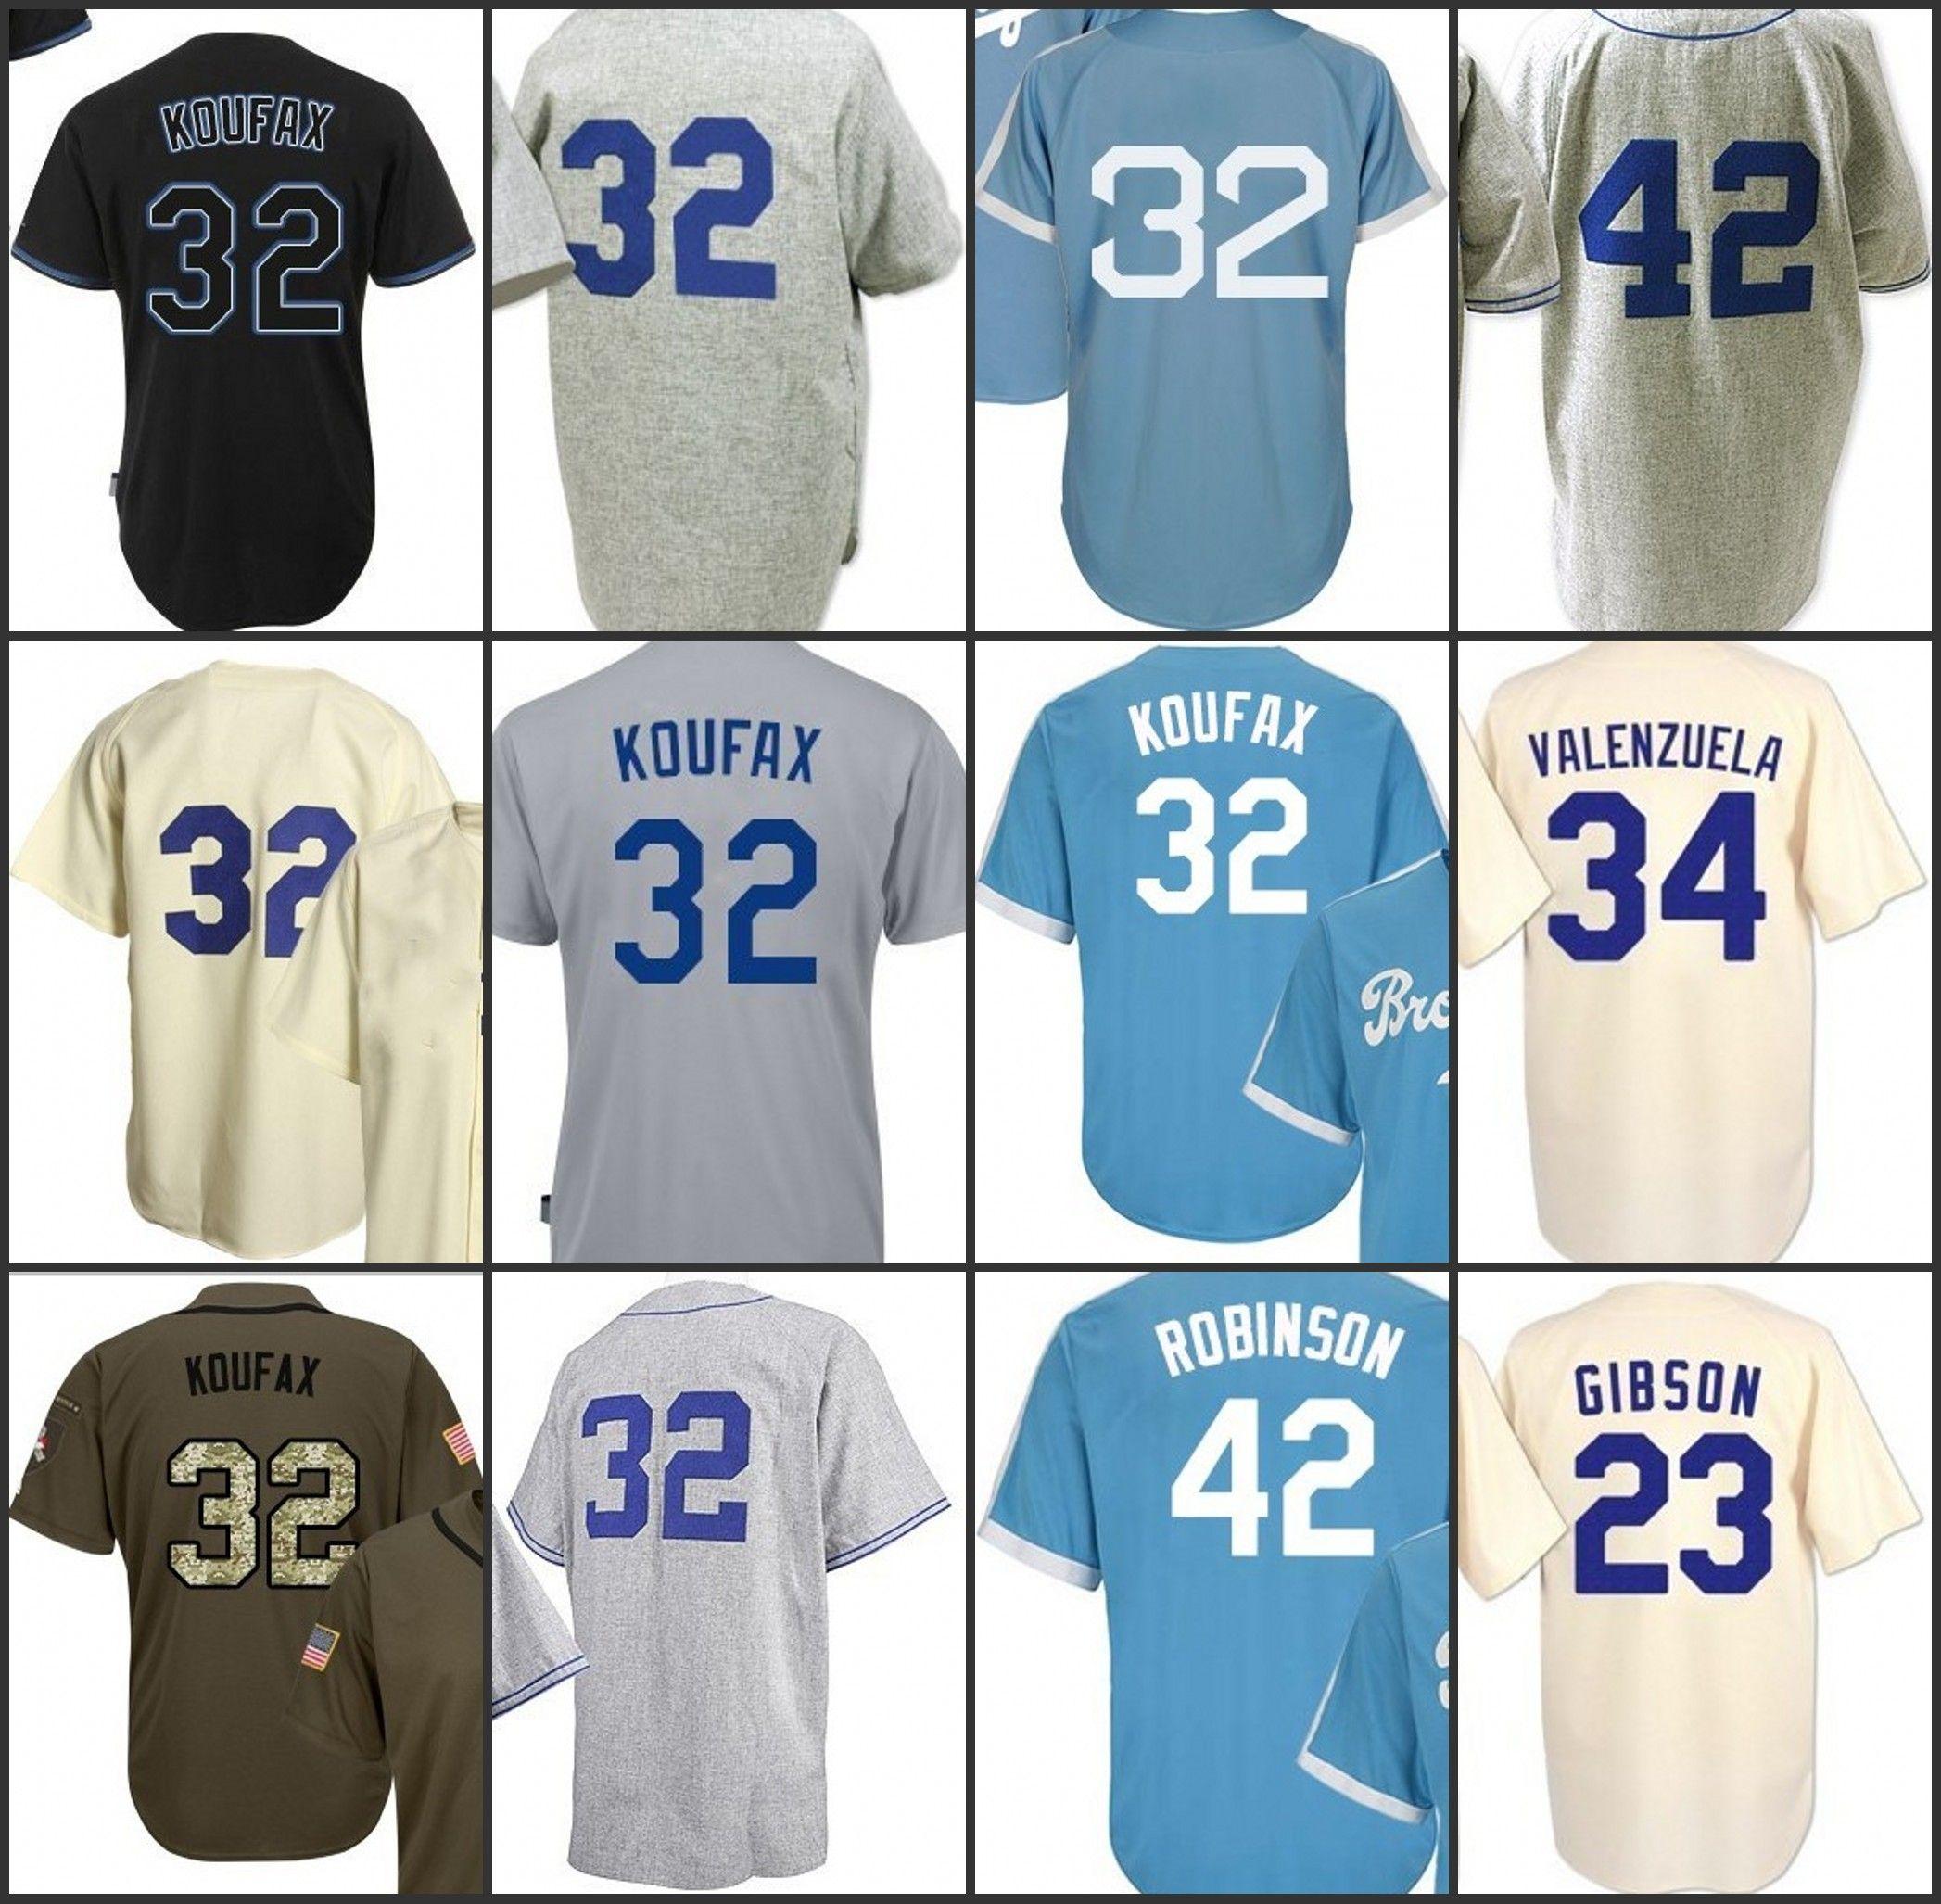 32 sandy koufax 42 player 23 kirk gibson 34 fernando valenzuela jersey mens authentic mitchell ness baseball jerseys sandy koufax jersey online with